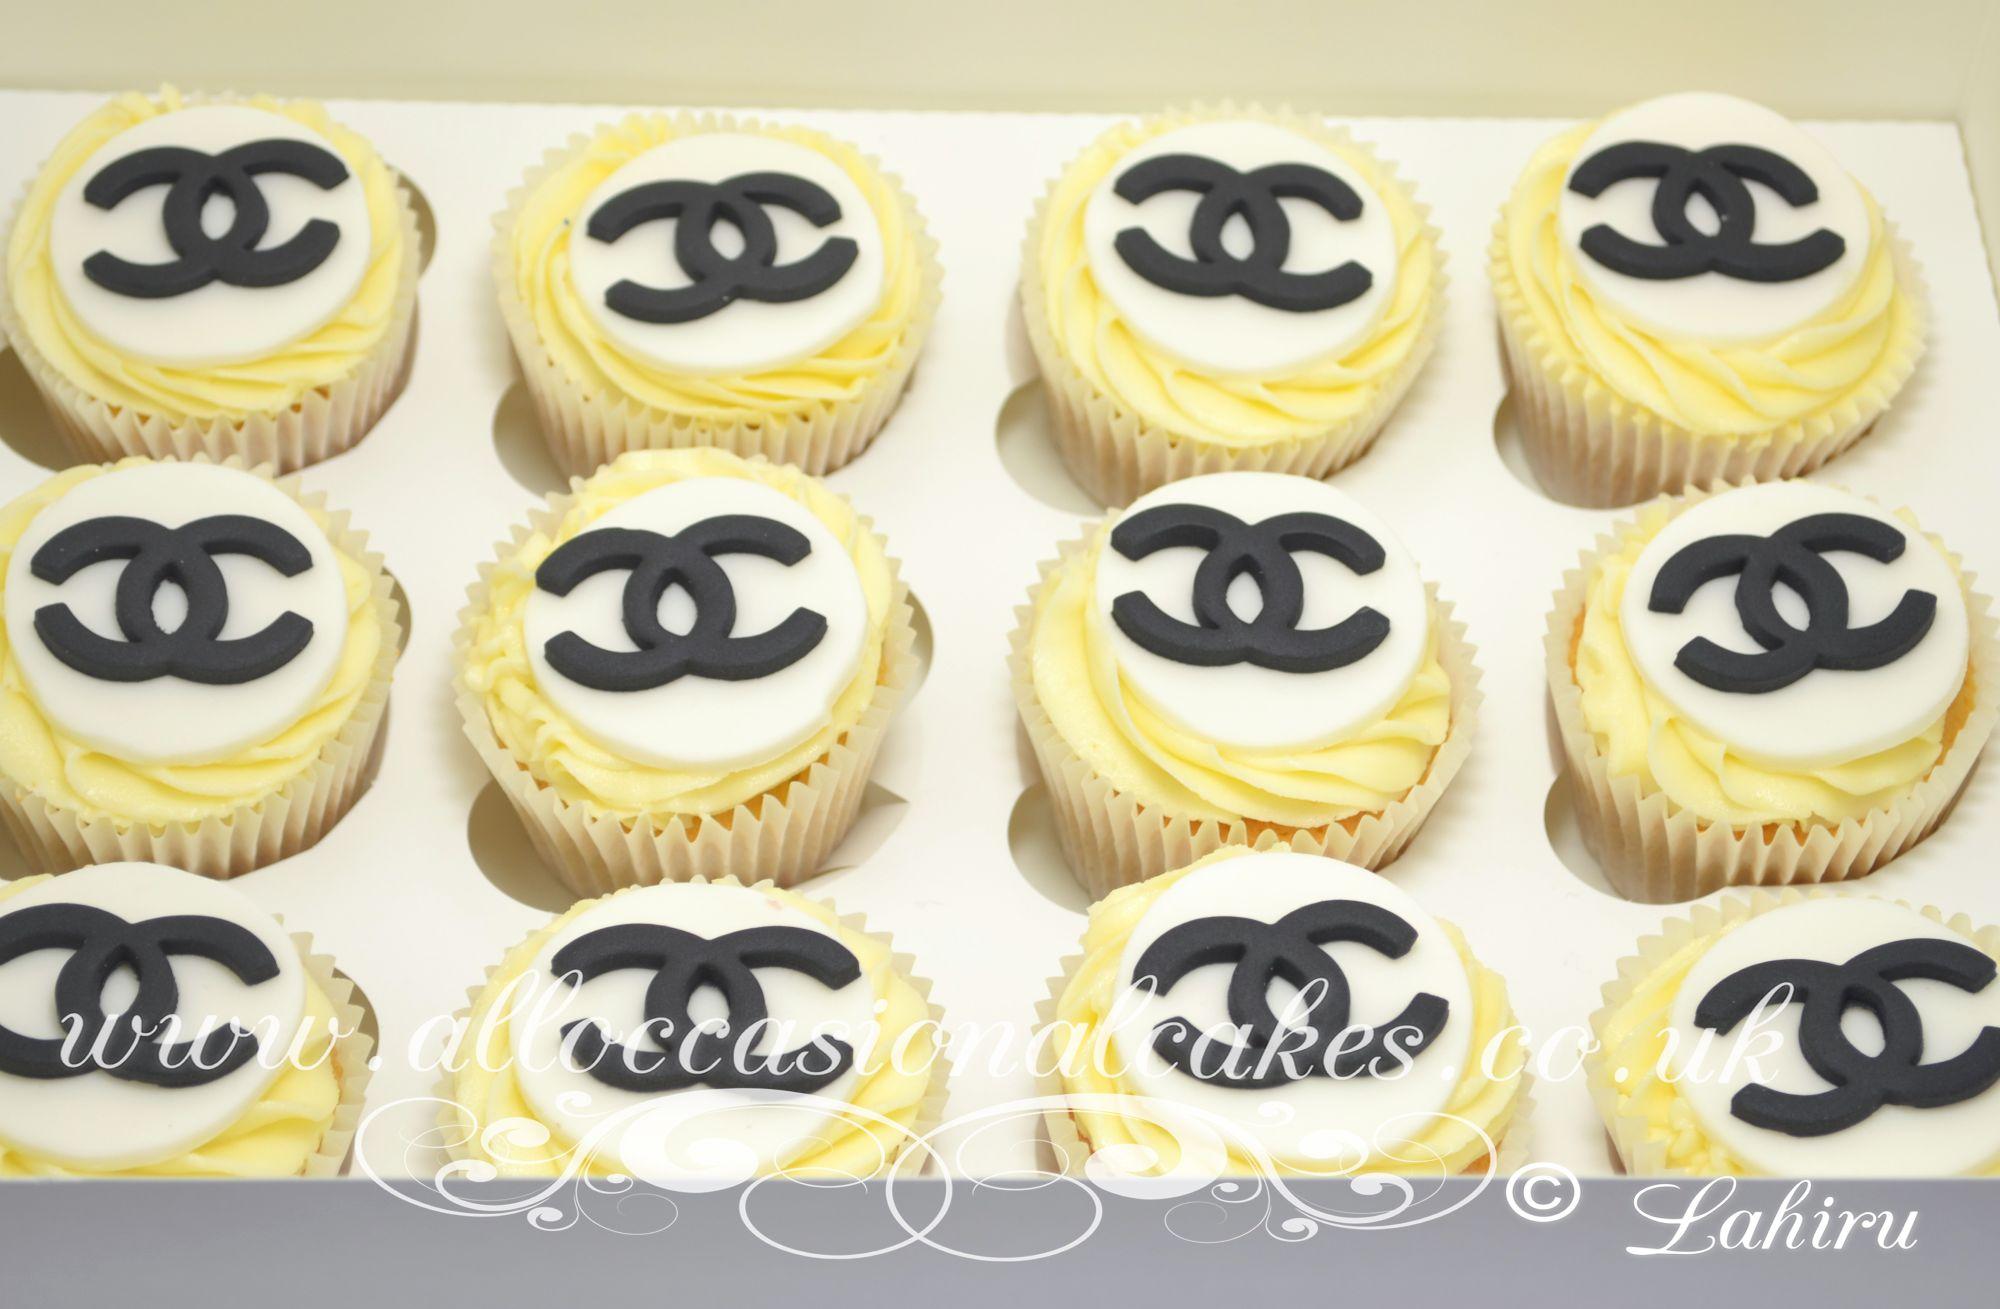 chanel logo cupcakes